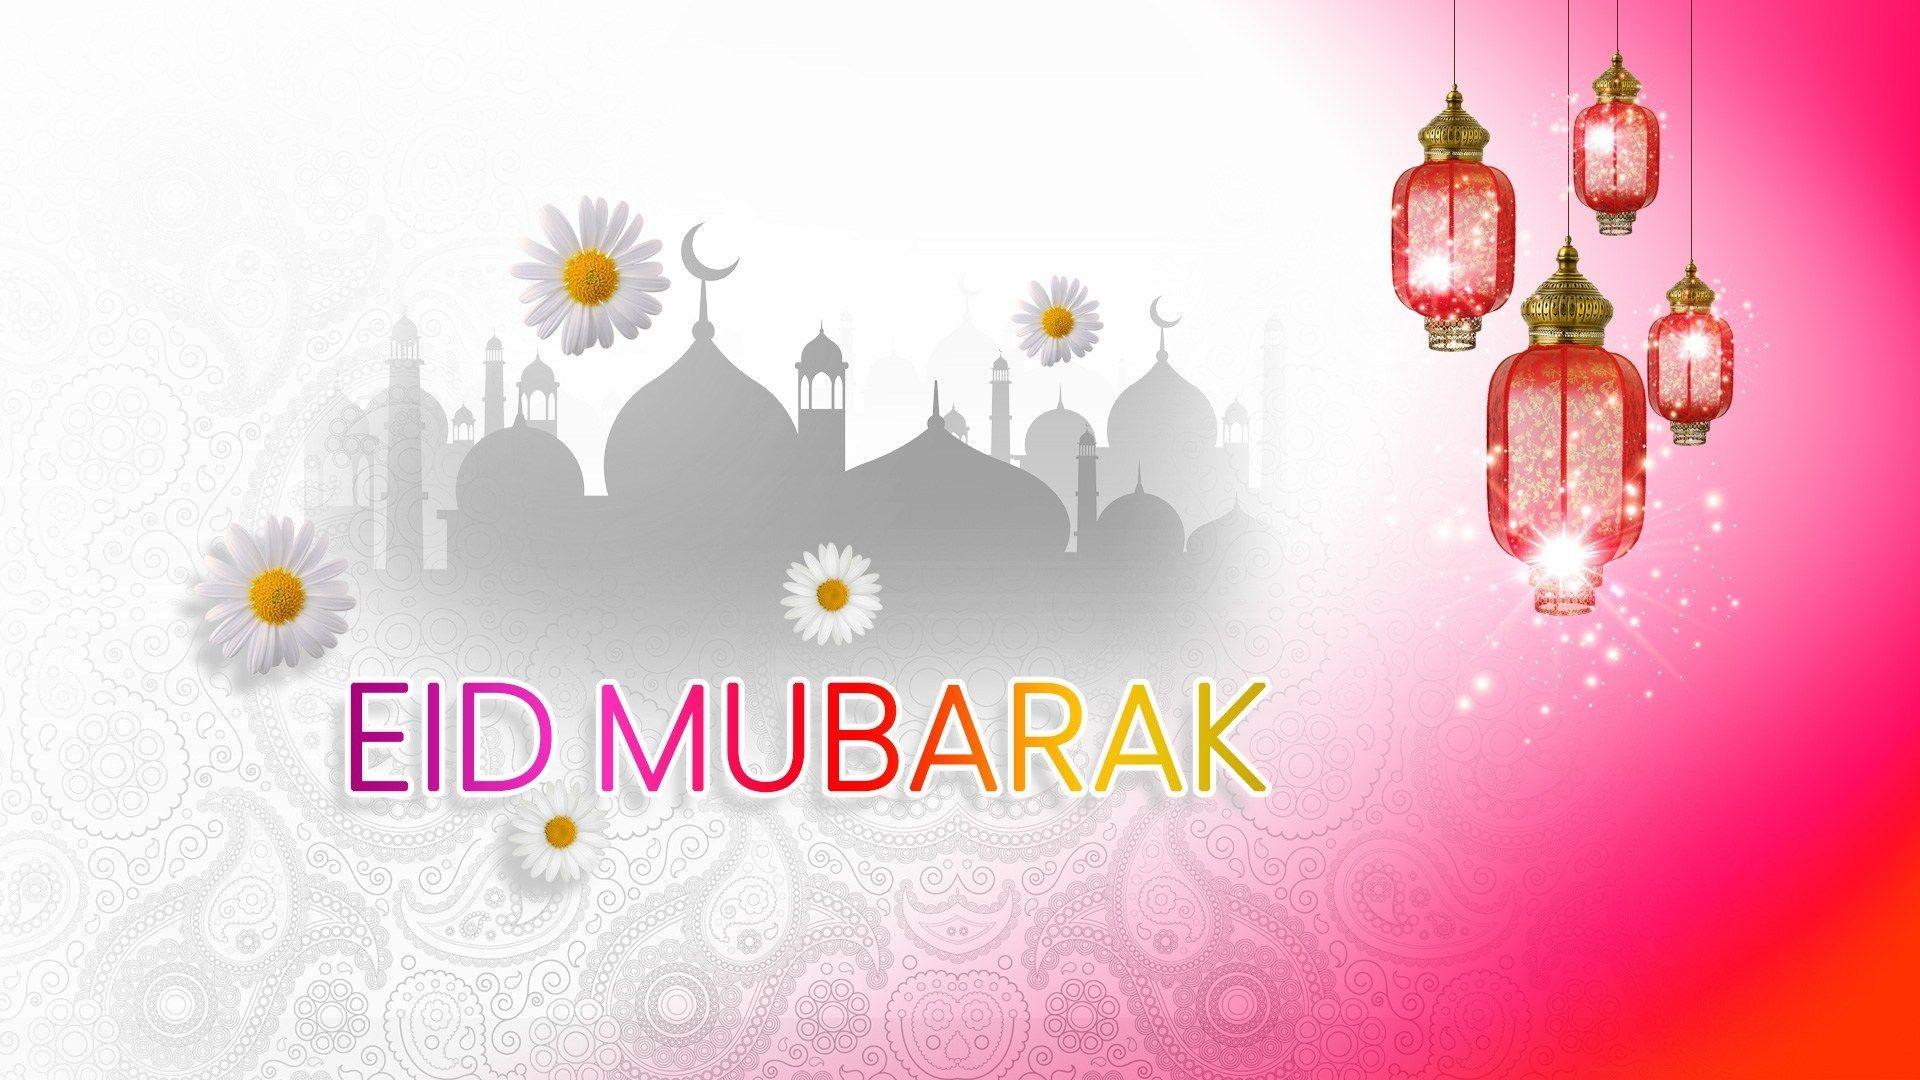 Beautiful Eid Mubarak Images Hd Photo Gallery Download Free 2019